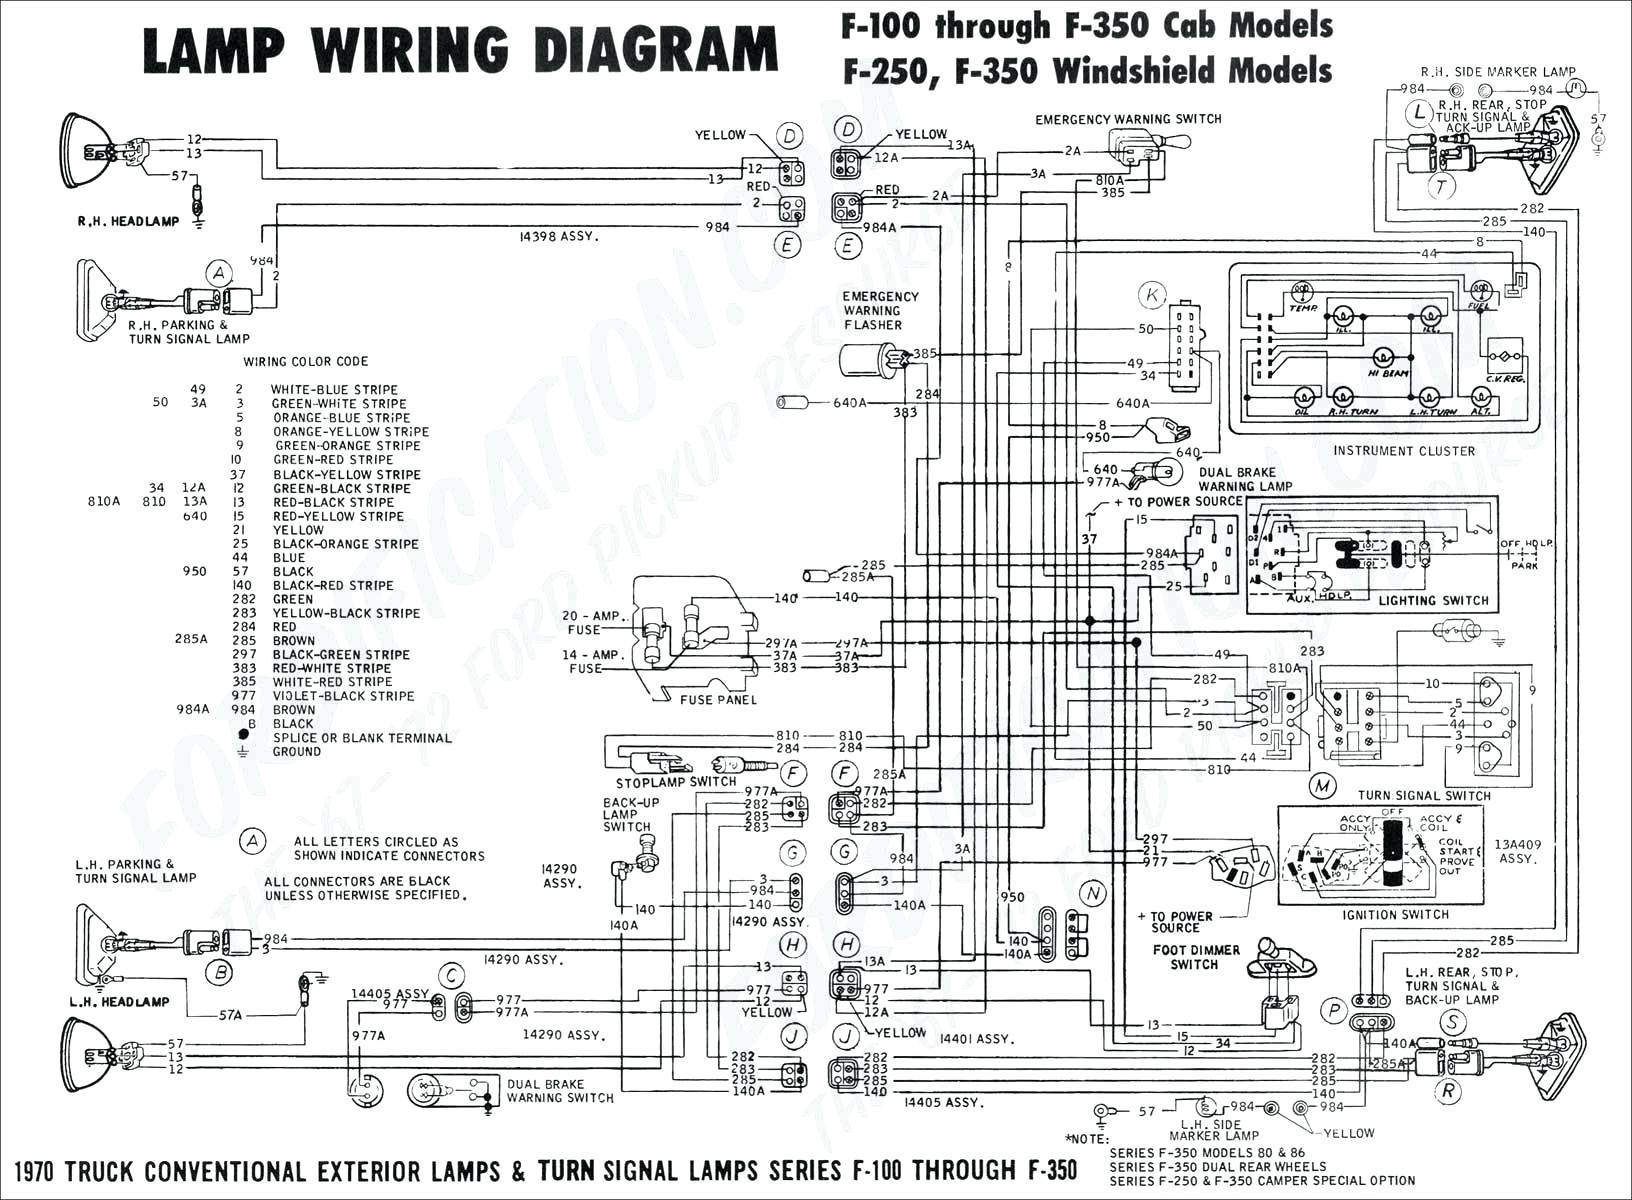 2004 ford F150 4 6 Engine Diagram 2000 ford Ranger Horn Wiring Another Blog About Wiring Diagram • Of 2004 ford F150 4 6 Engine Diagram